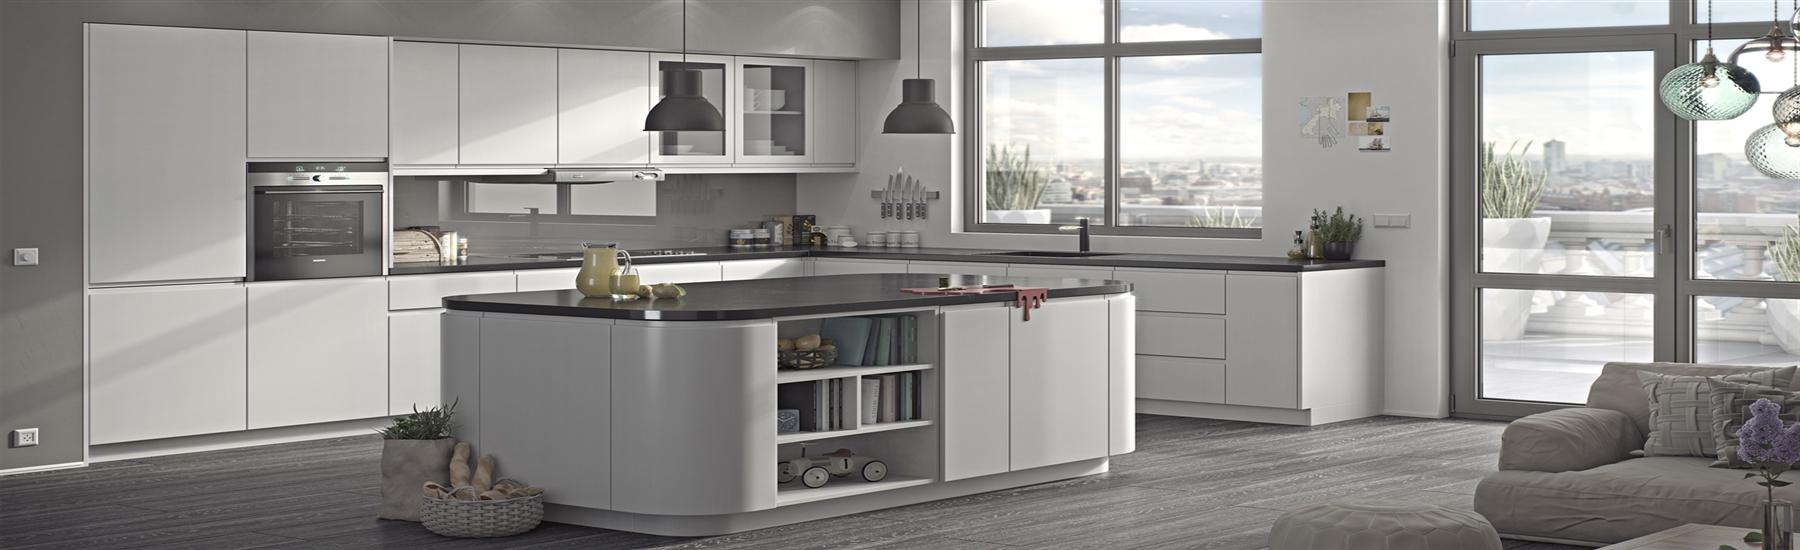 opus-handleless-kitchen